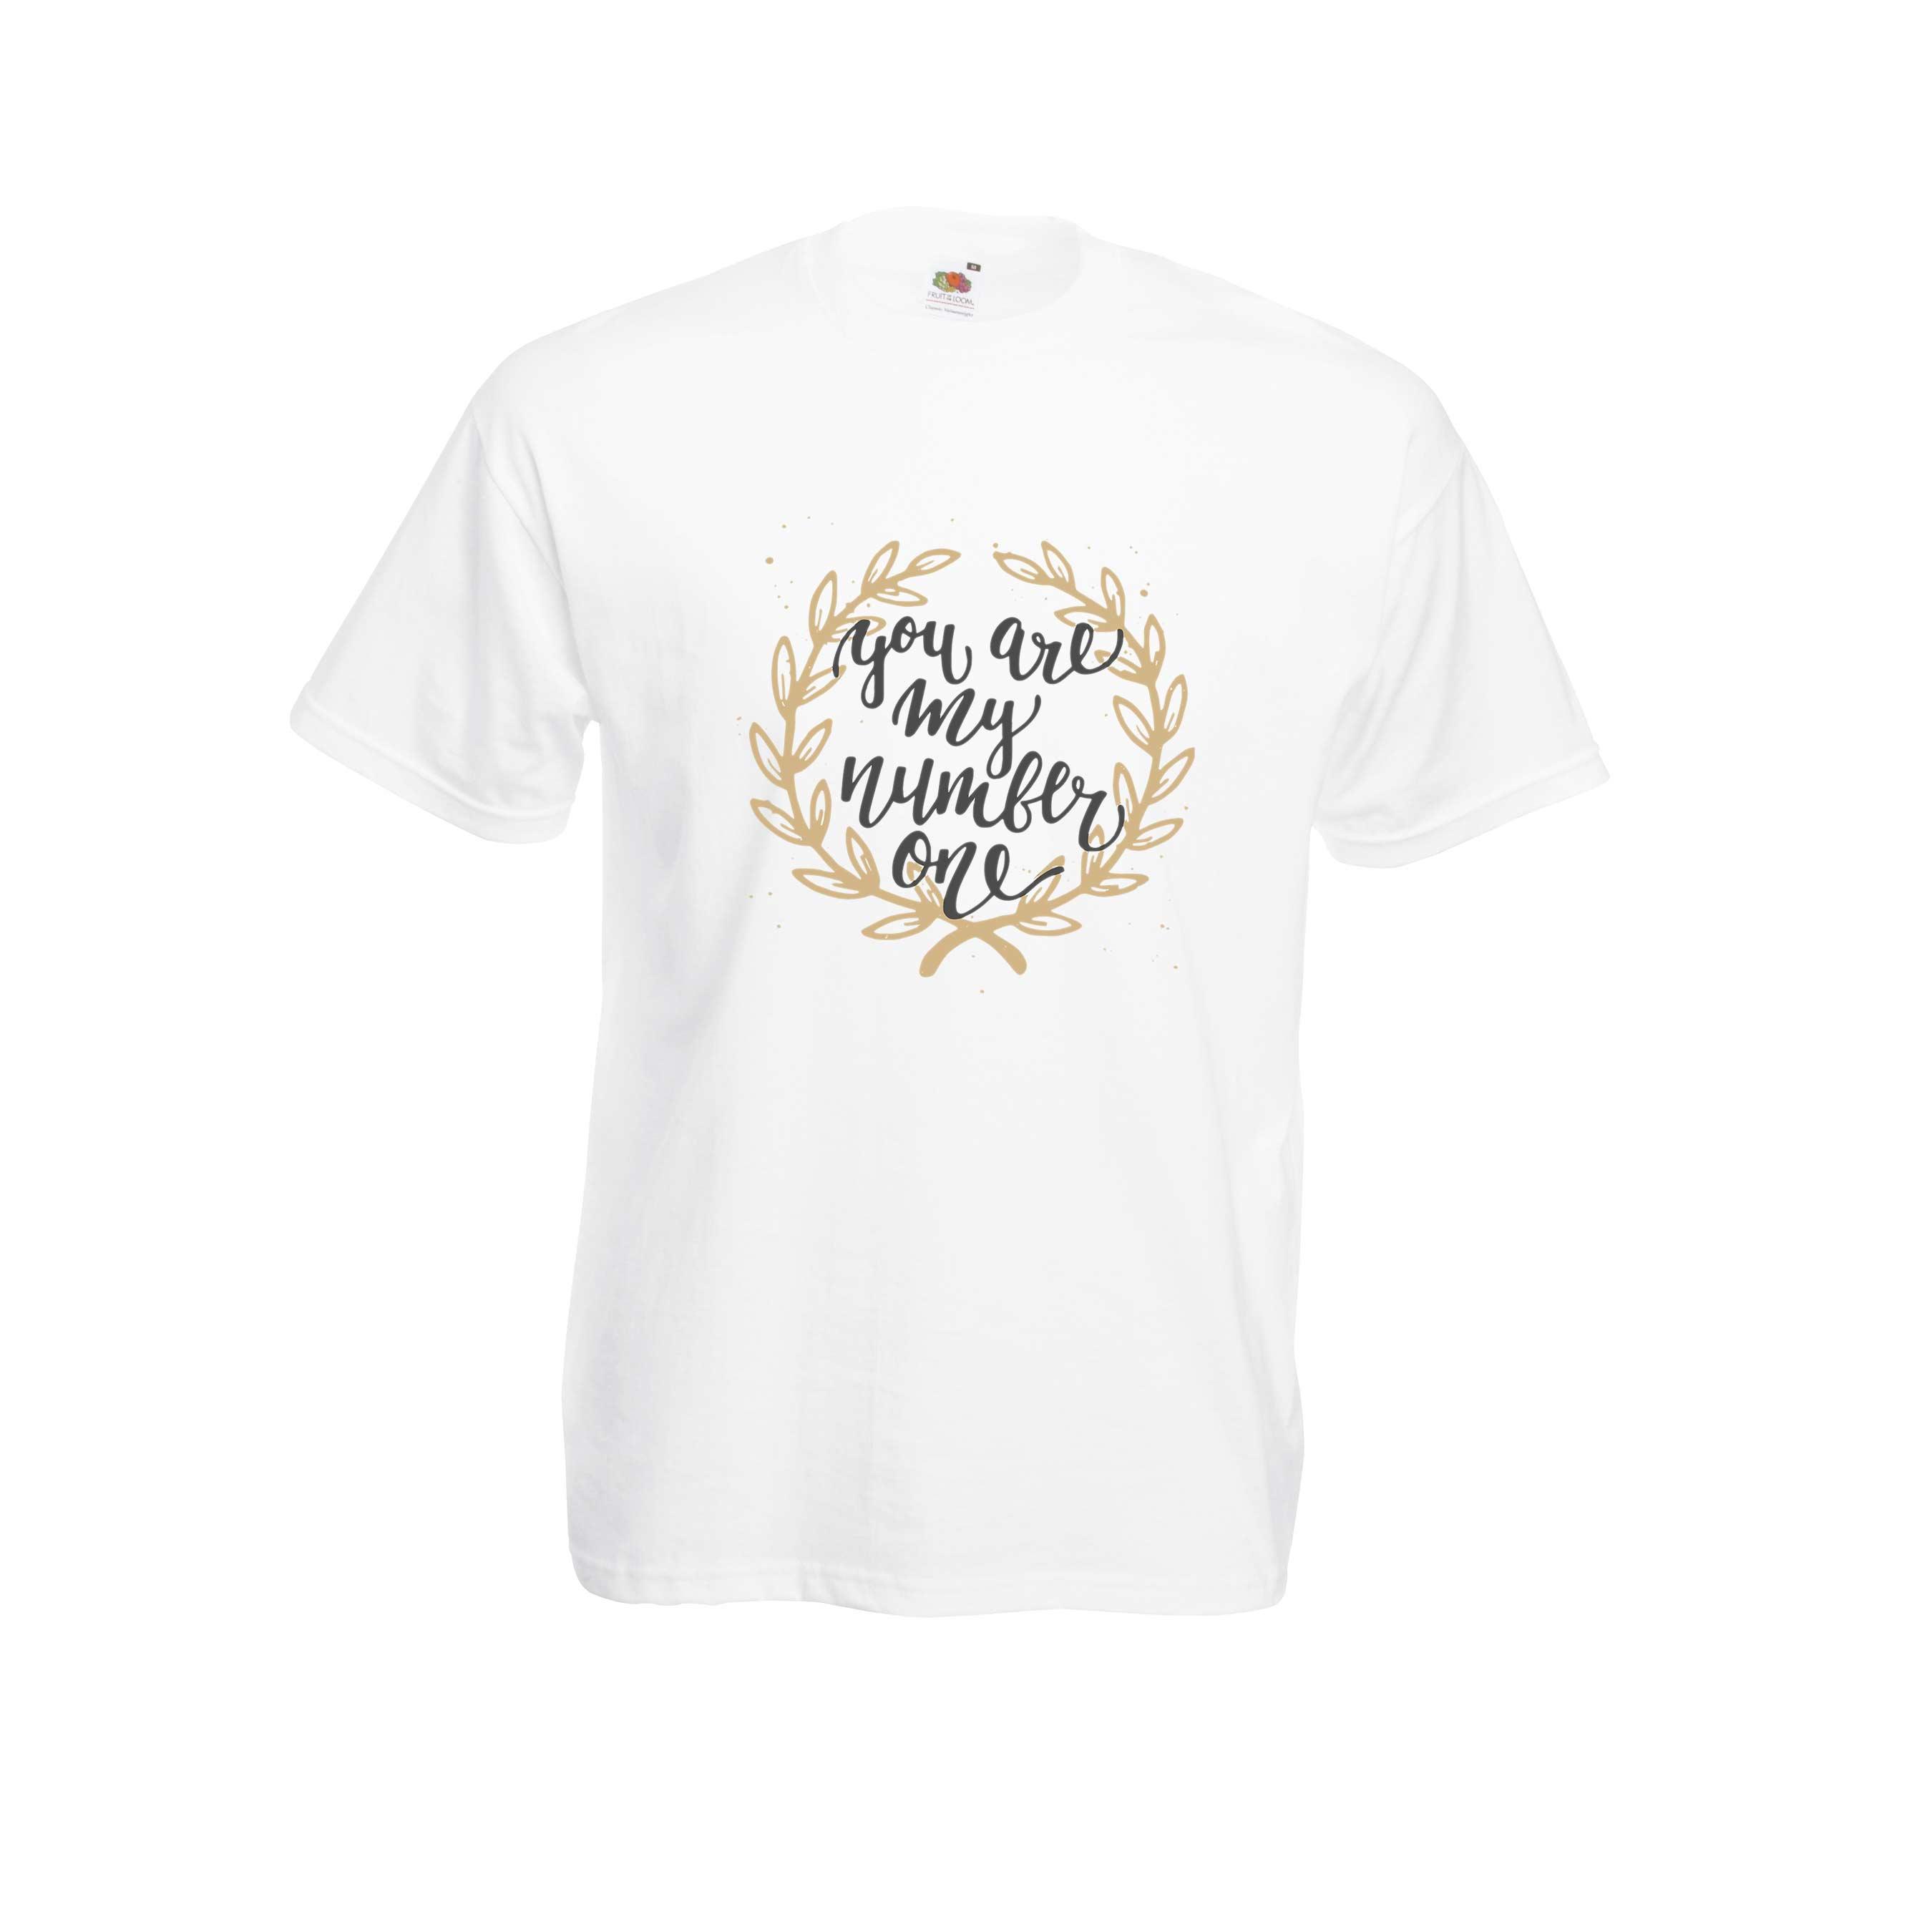 Number One design for t-shirt, hoodie & sweatshirt